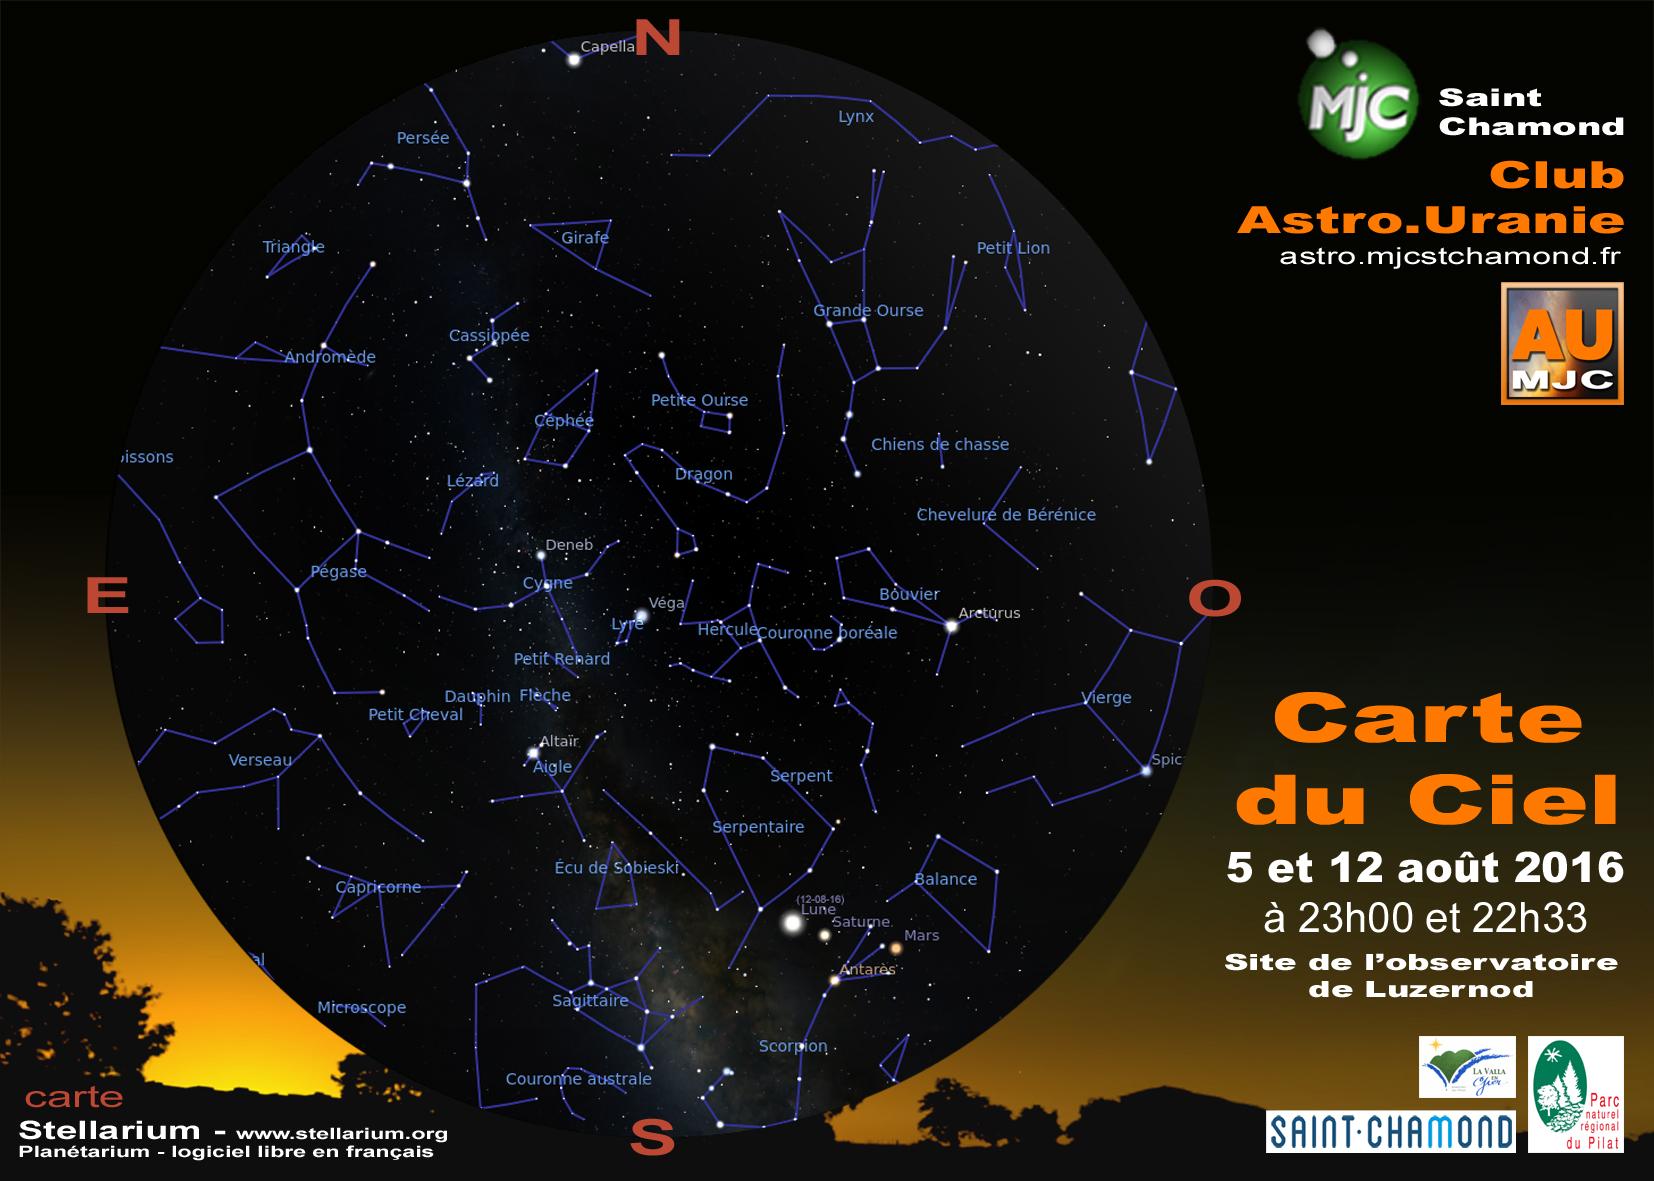 carte_16-08-05_23h00